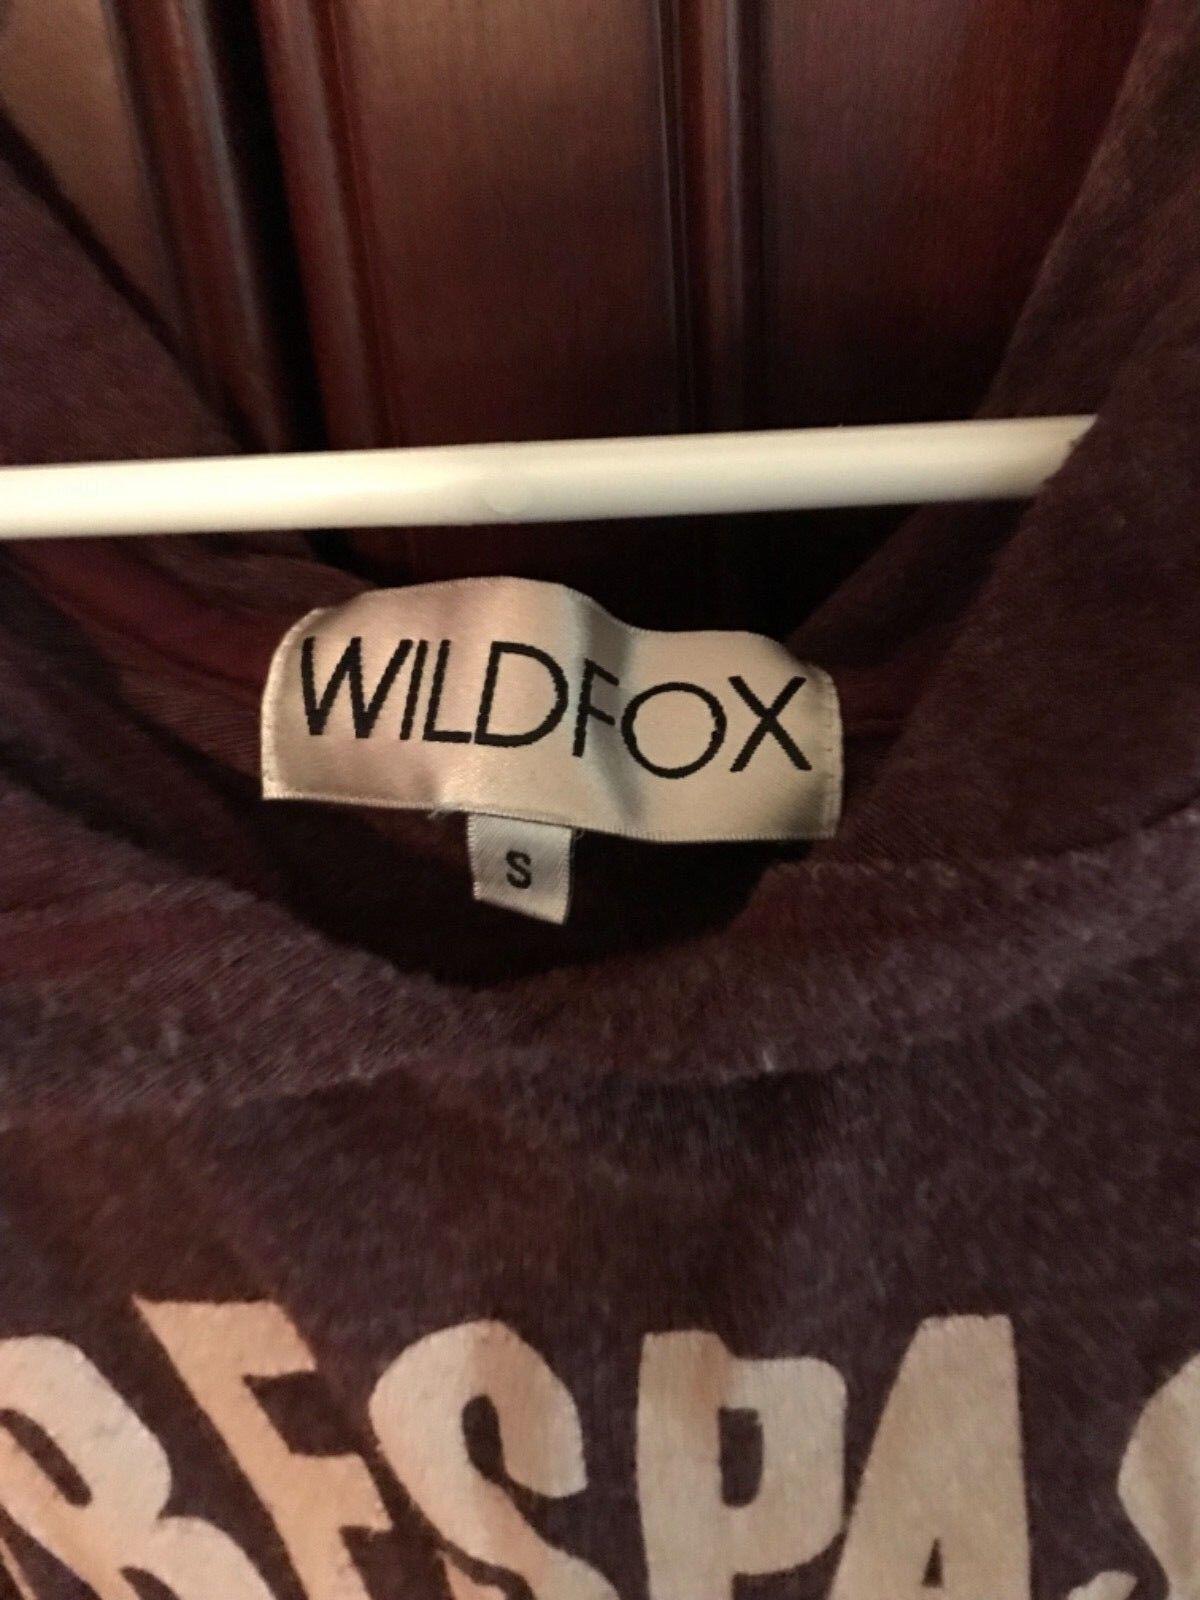 Wildfox Trespass Trespass Trespass Sweetly Urged Gypsy Hoodie Small Burgandy NWOT 86aa2e